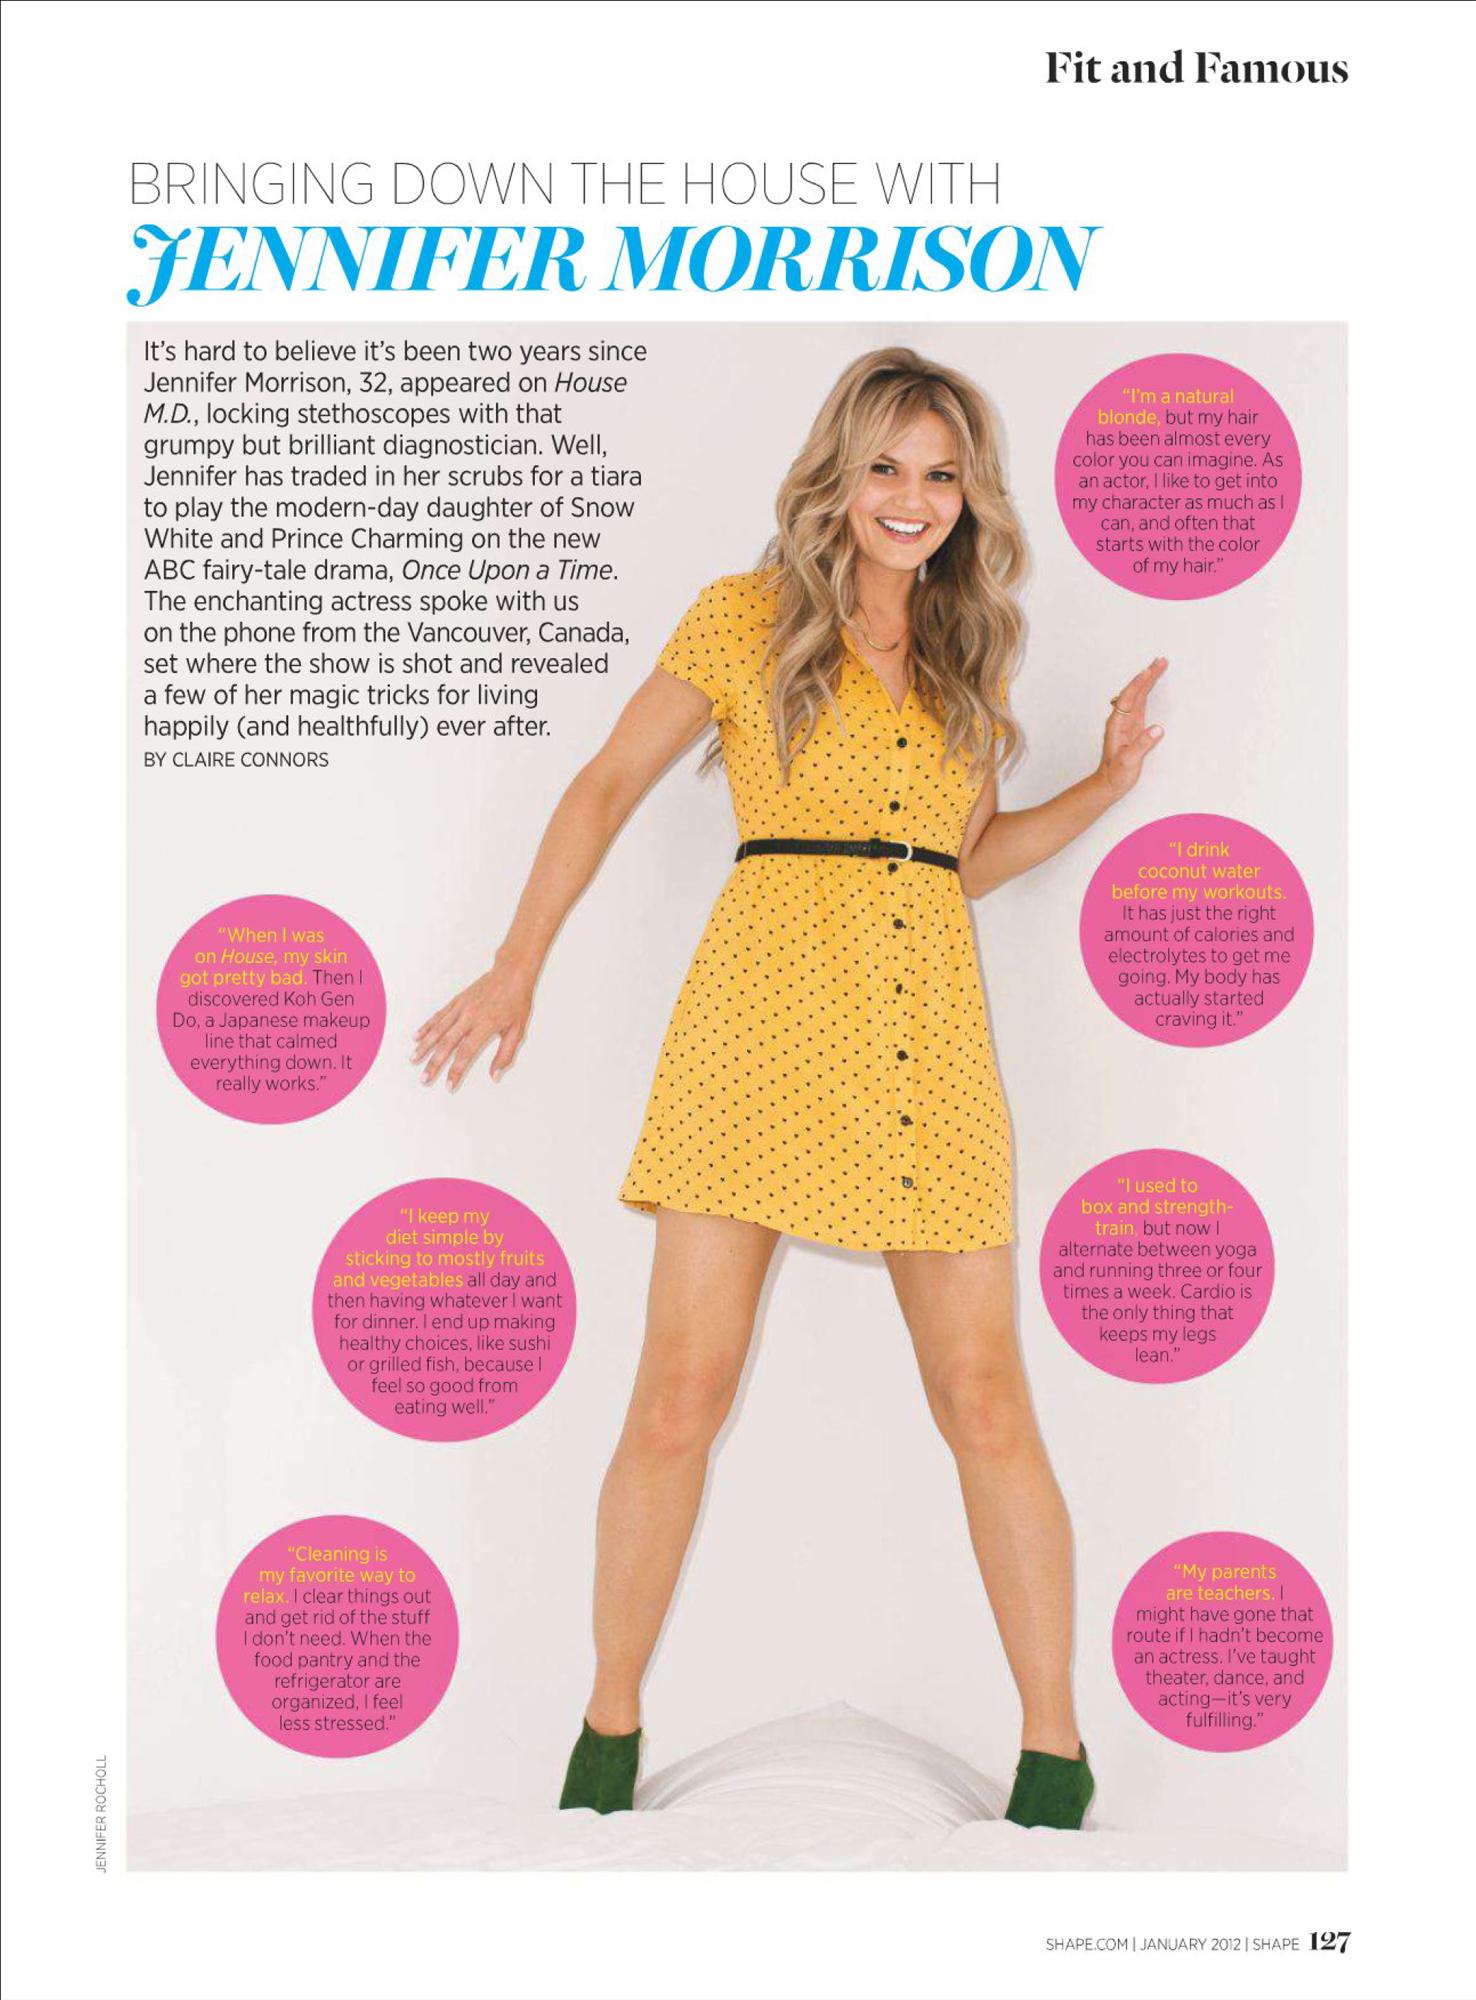 Jennifer Morrison images Shape Magazine - Jan 2012 HD wallpaper and